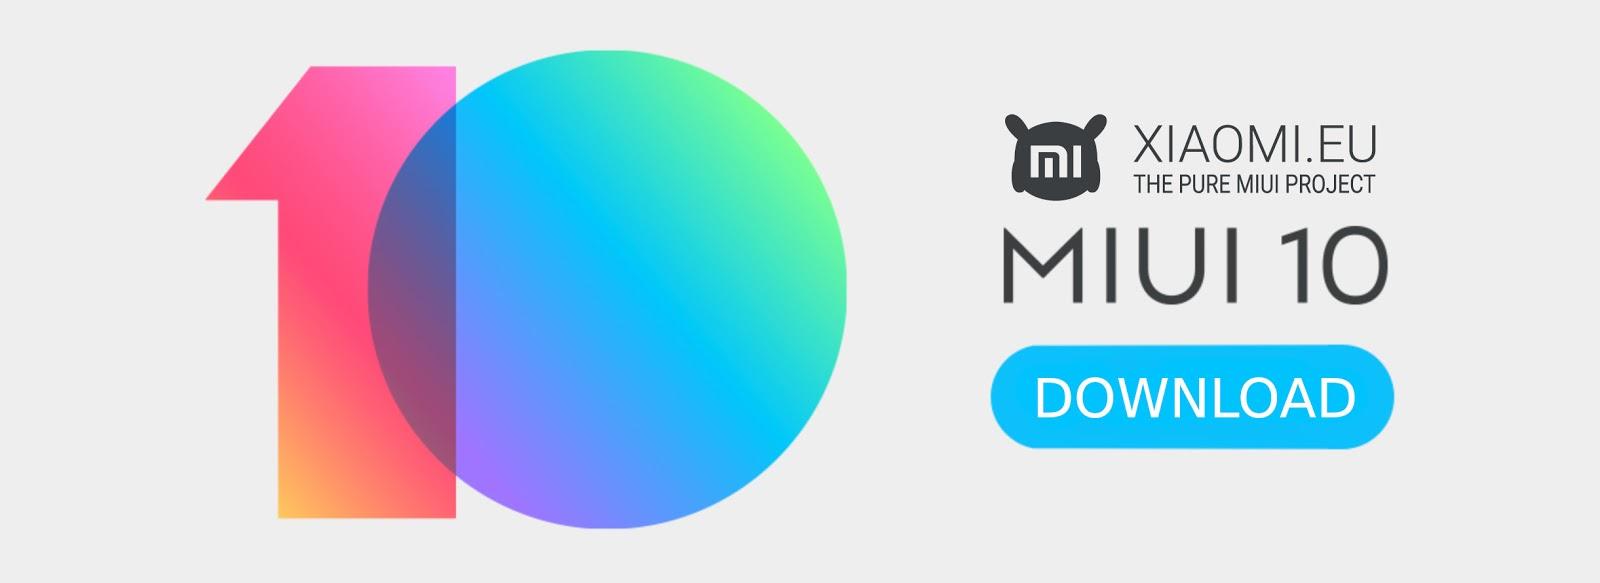 MIUI 10 EU 9 5 30 weekly ROM for Xiaomi Redmi Note 7 Pro